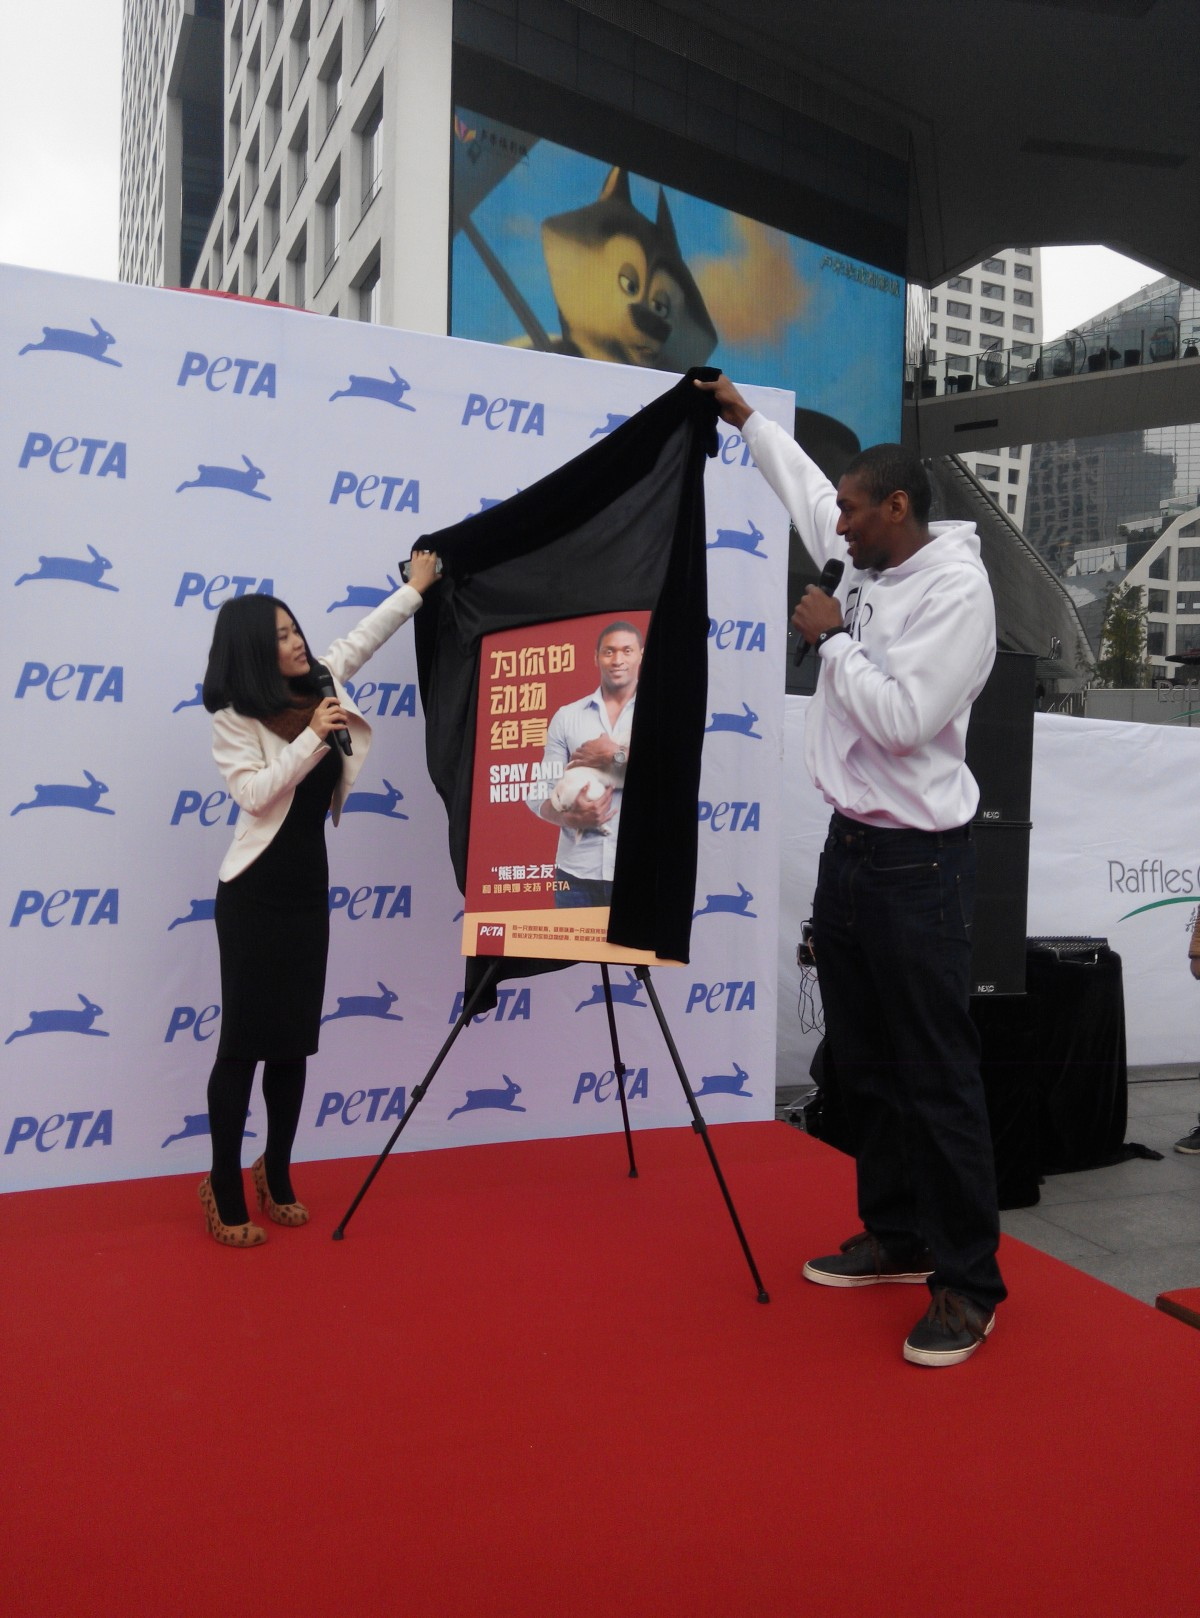 Metta World Peace ad launch